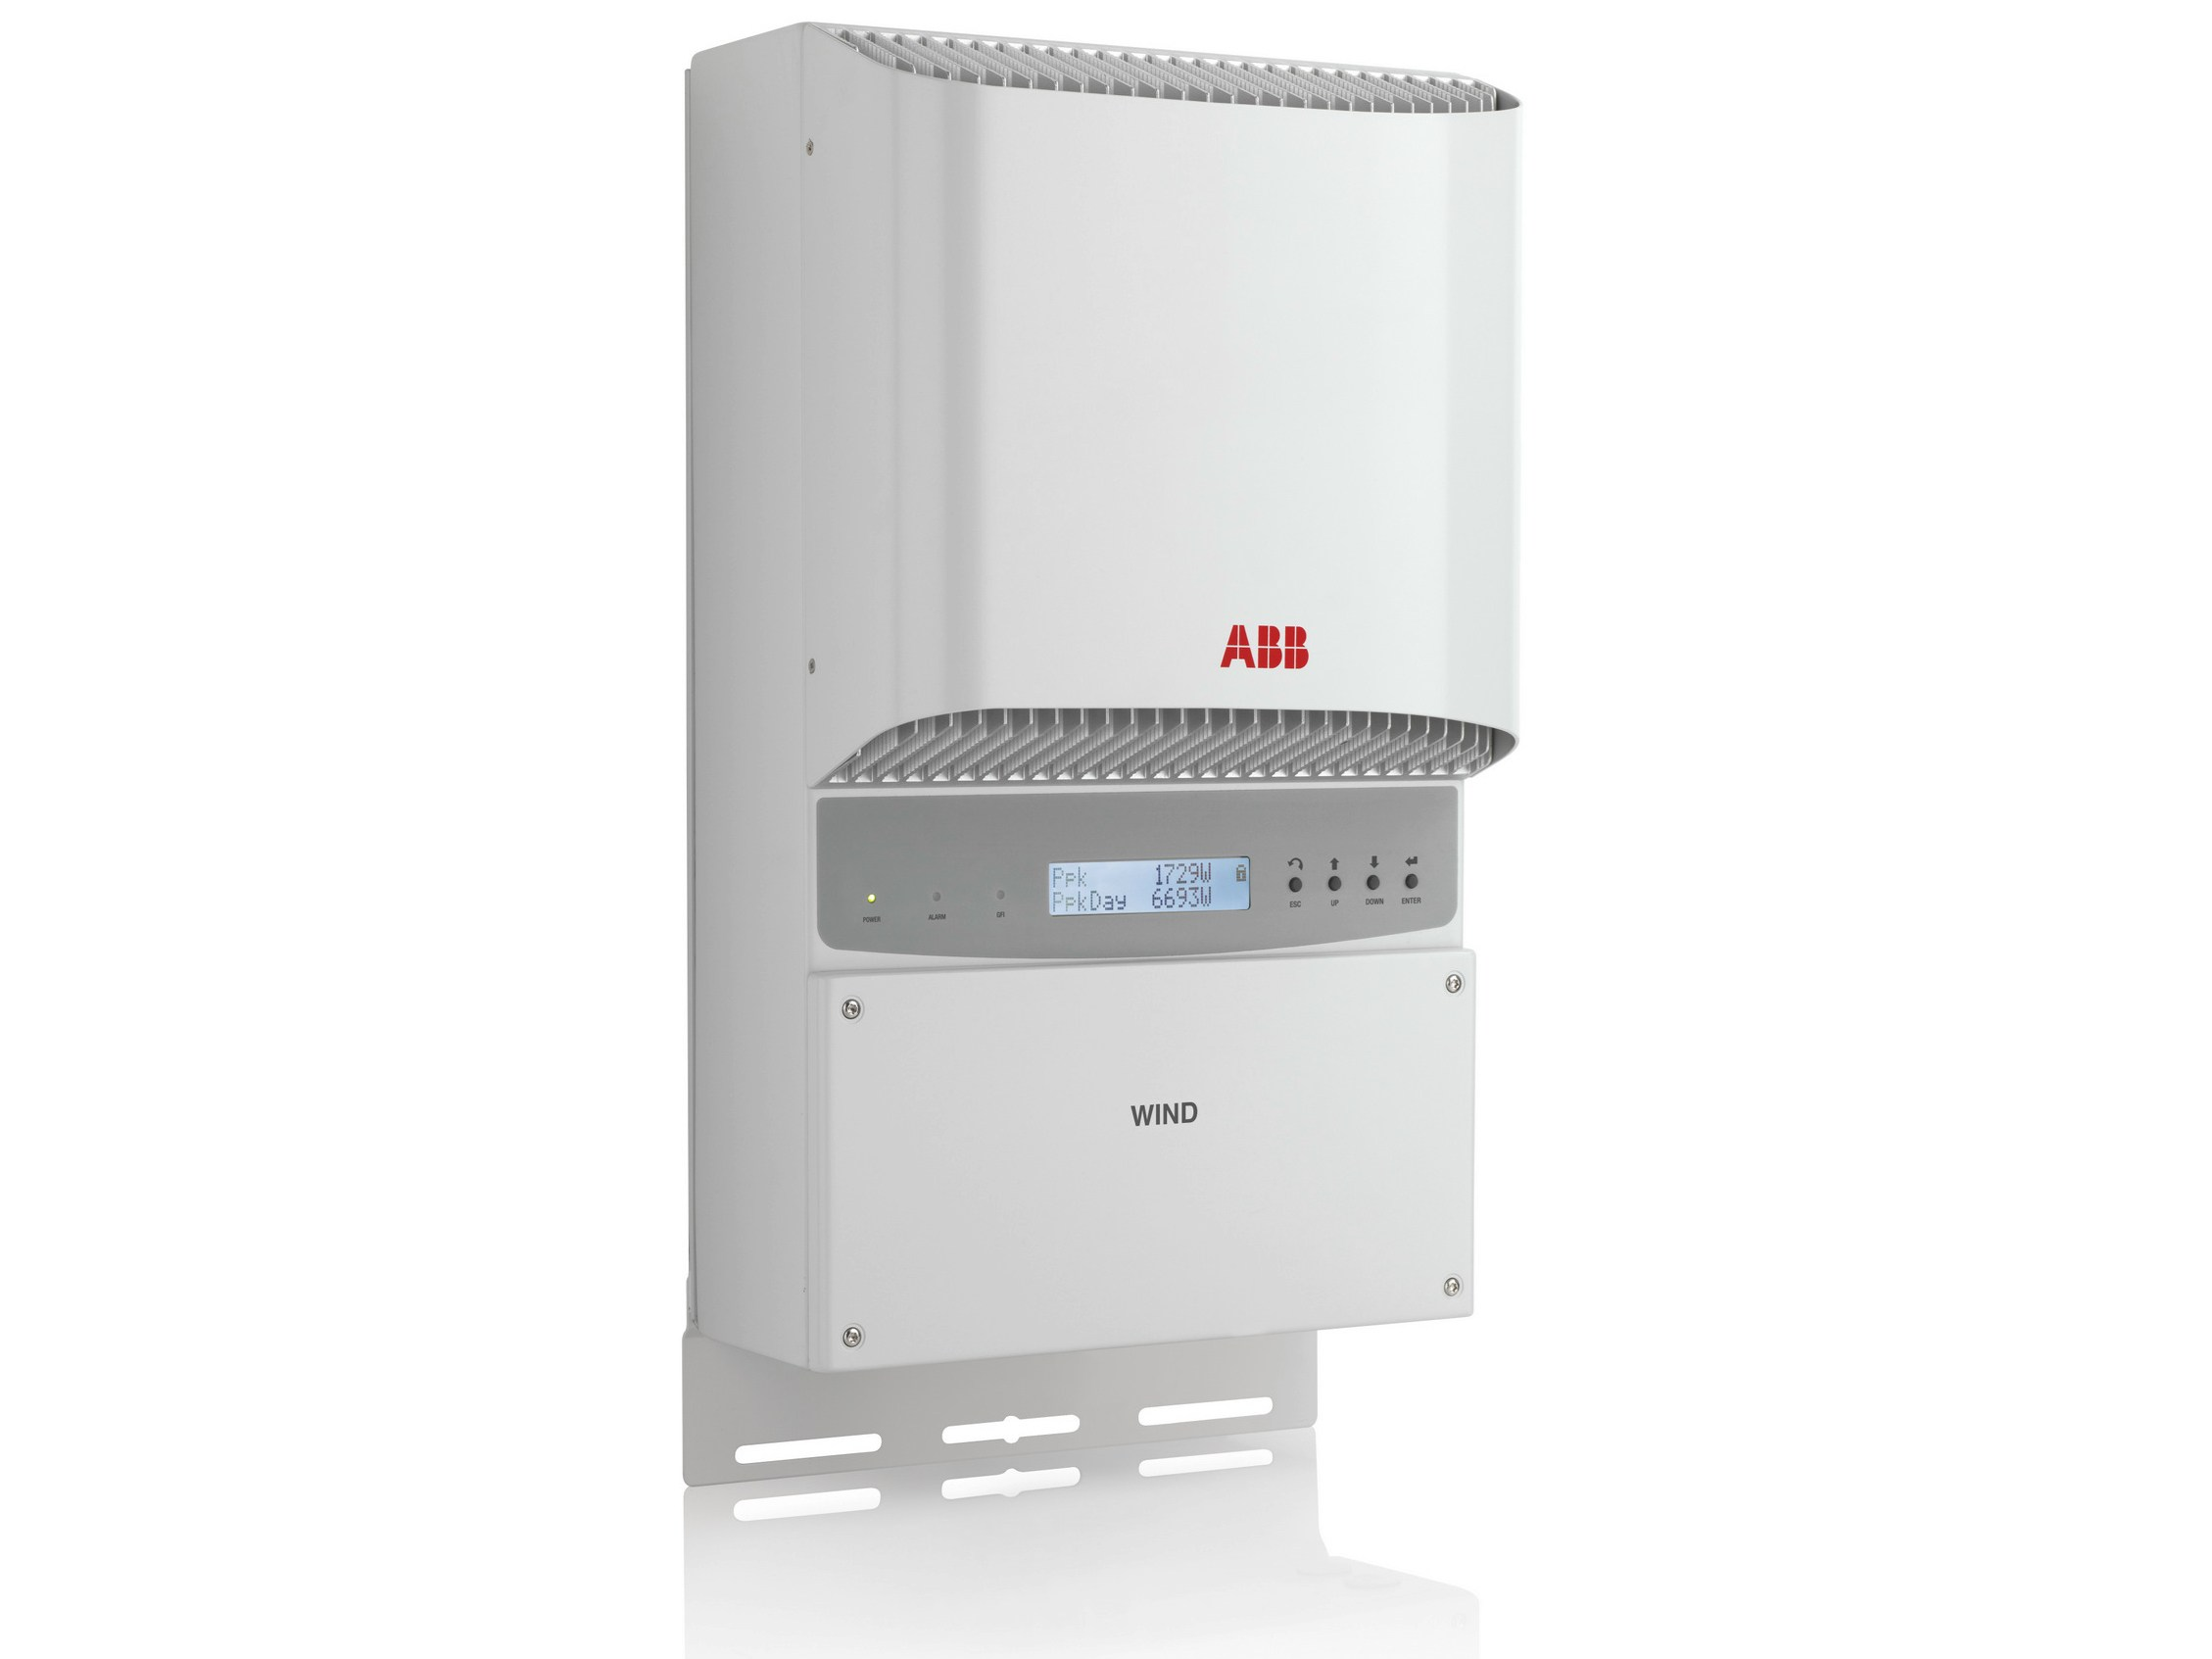 Inverter Per Impianti Eolici Pvi 3 6 Tl Outd W By Abb